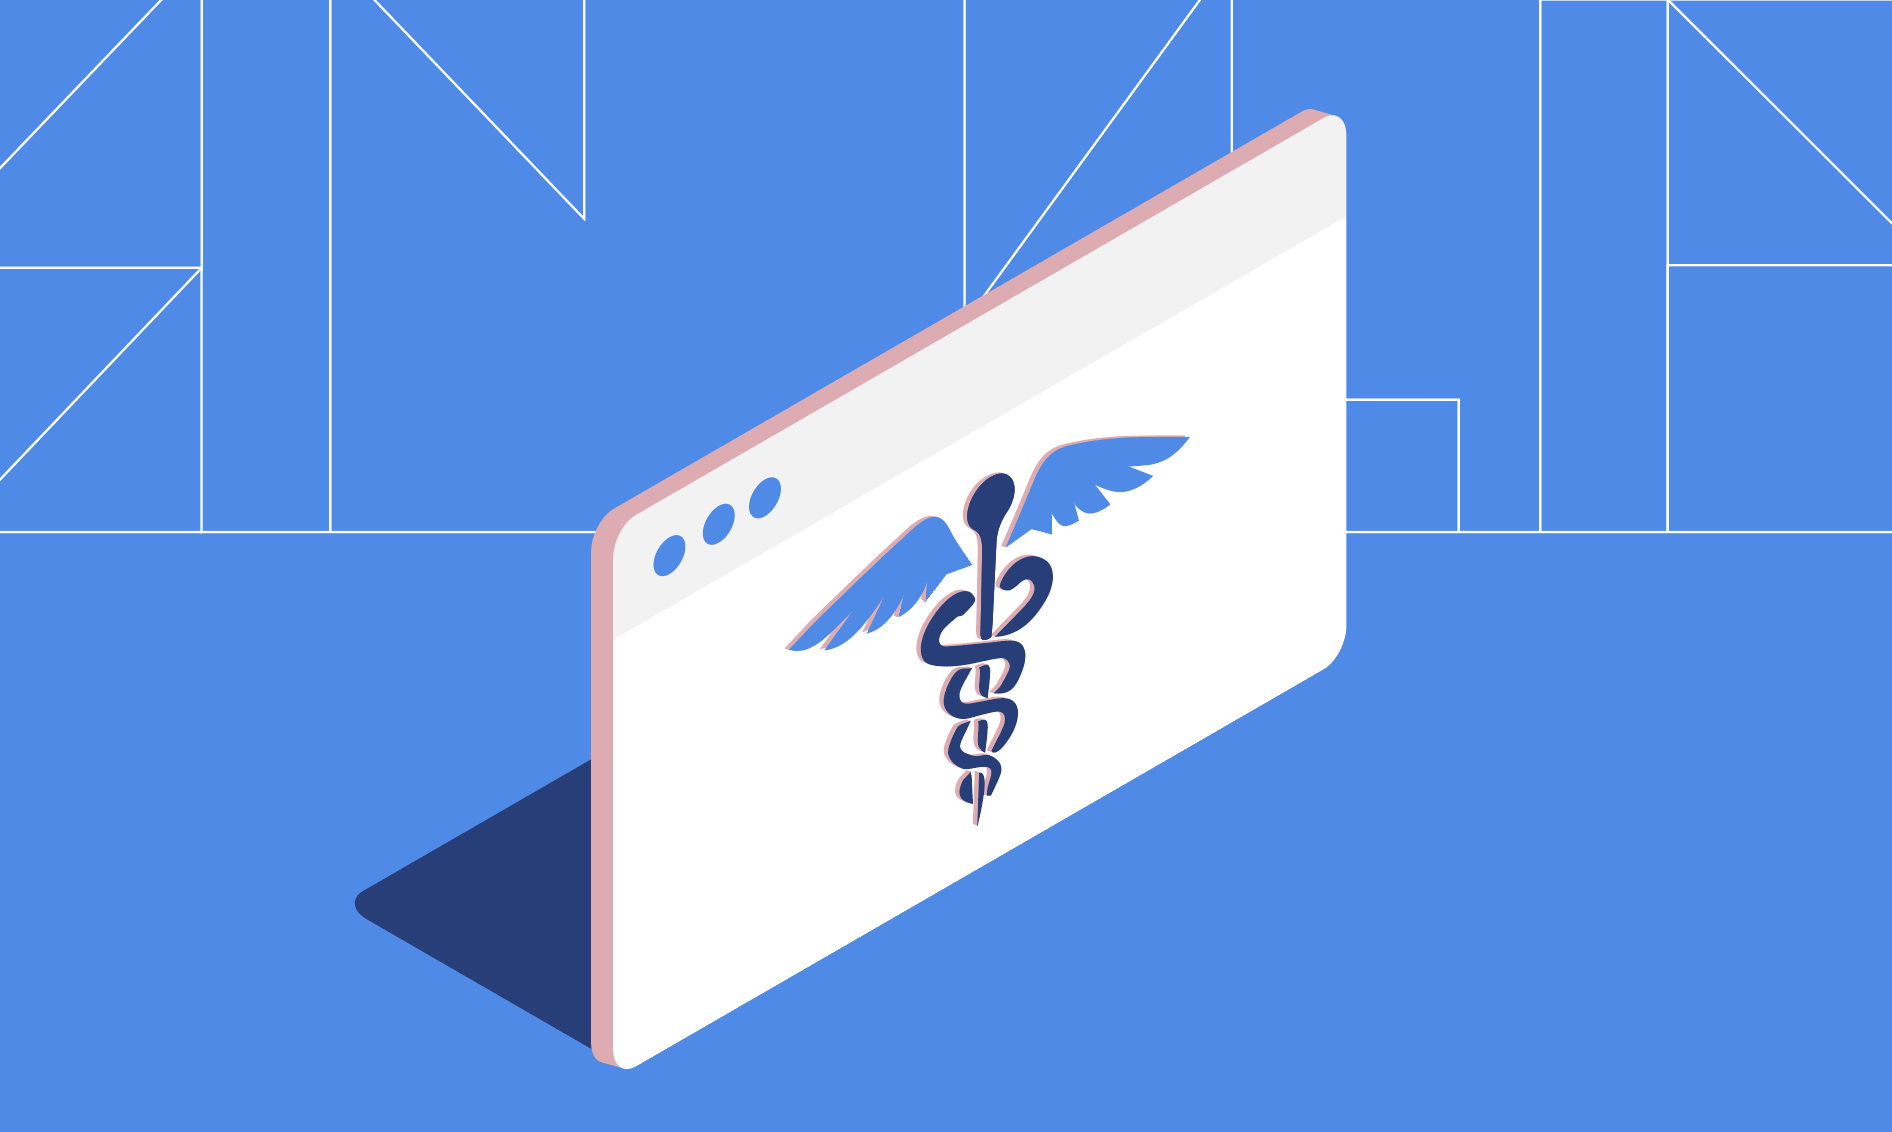 Illustrated American Medical Association Symbol of Caduceus